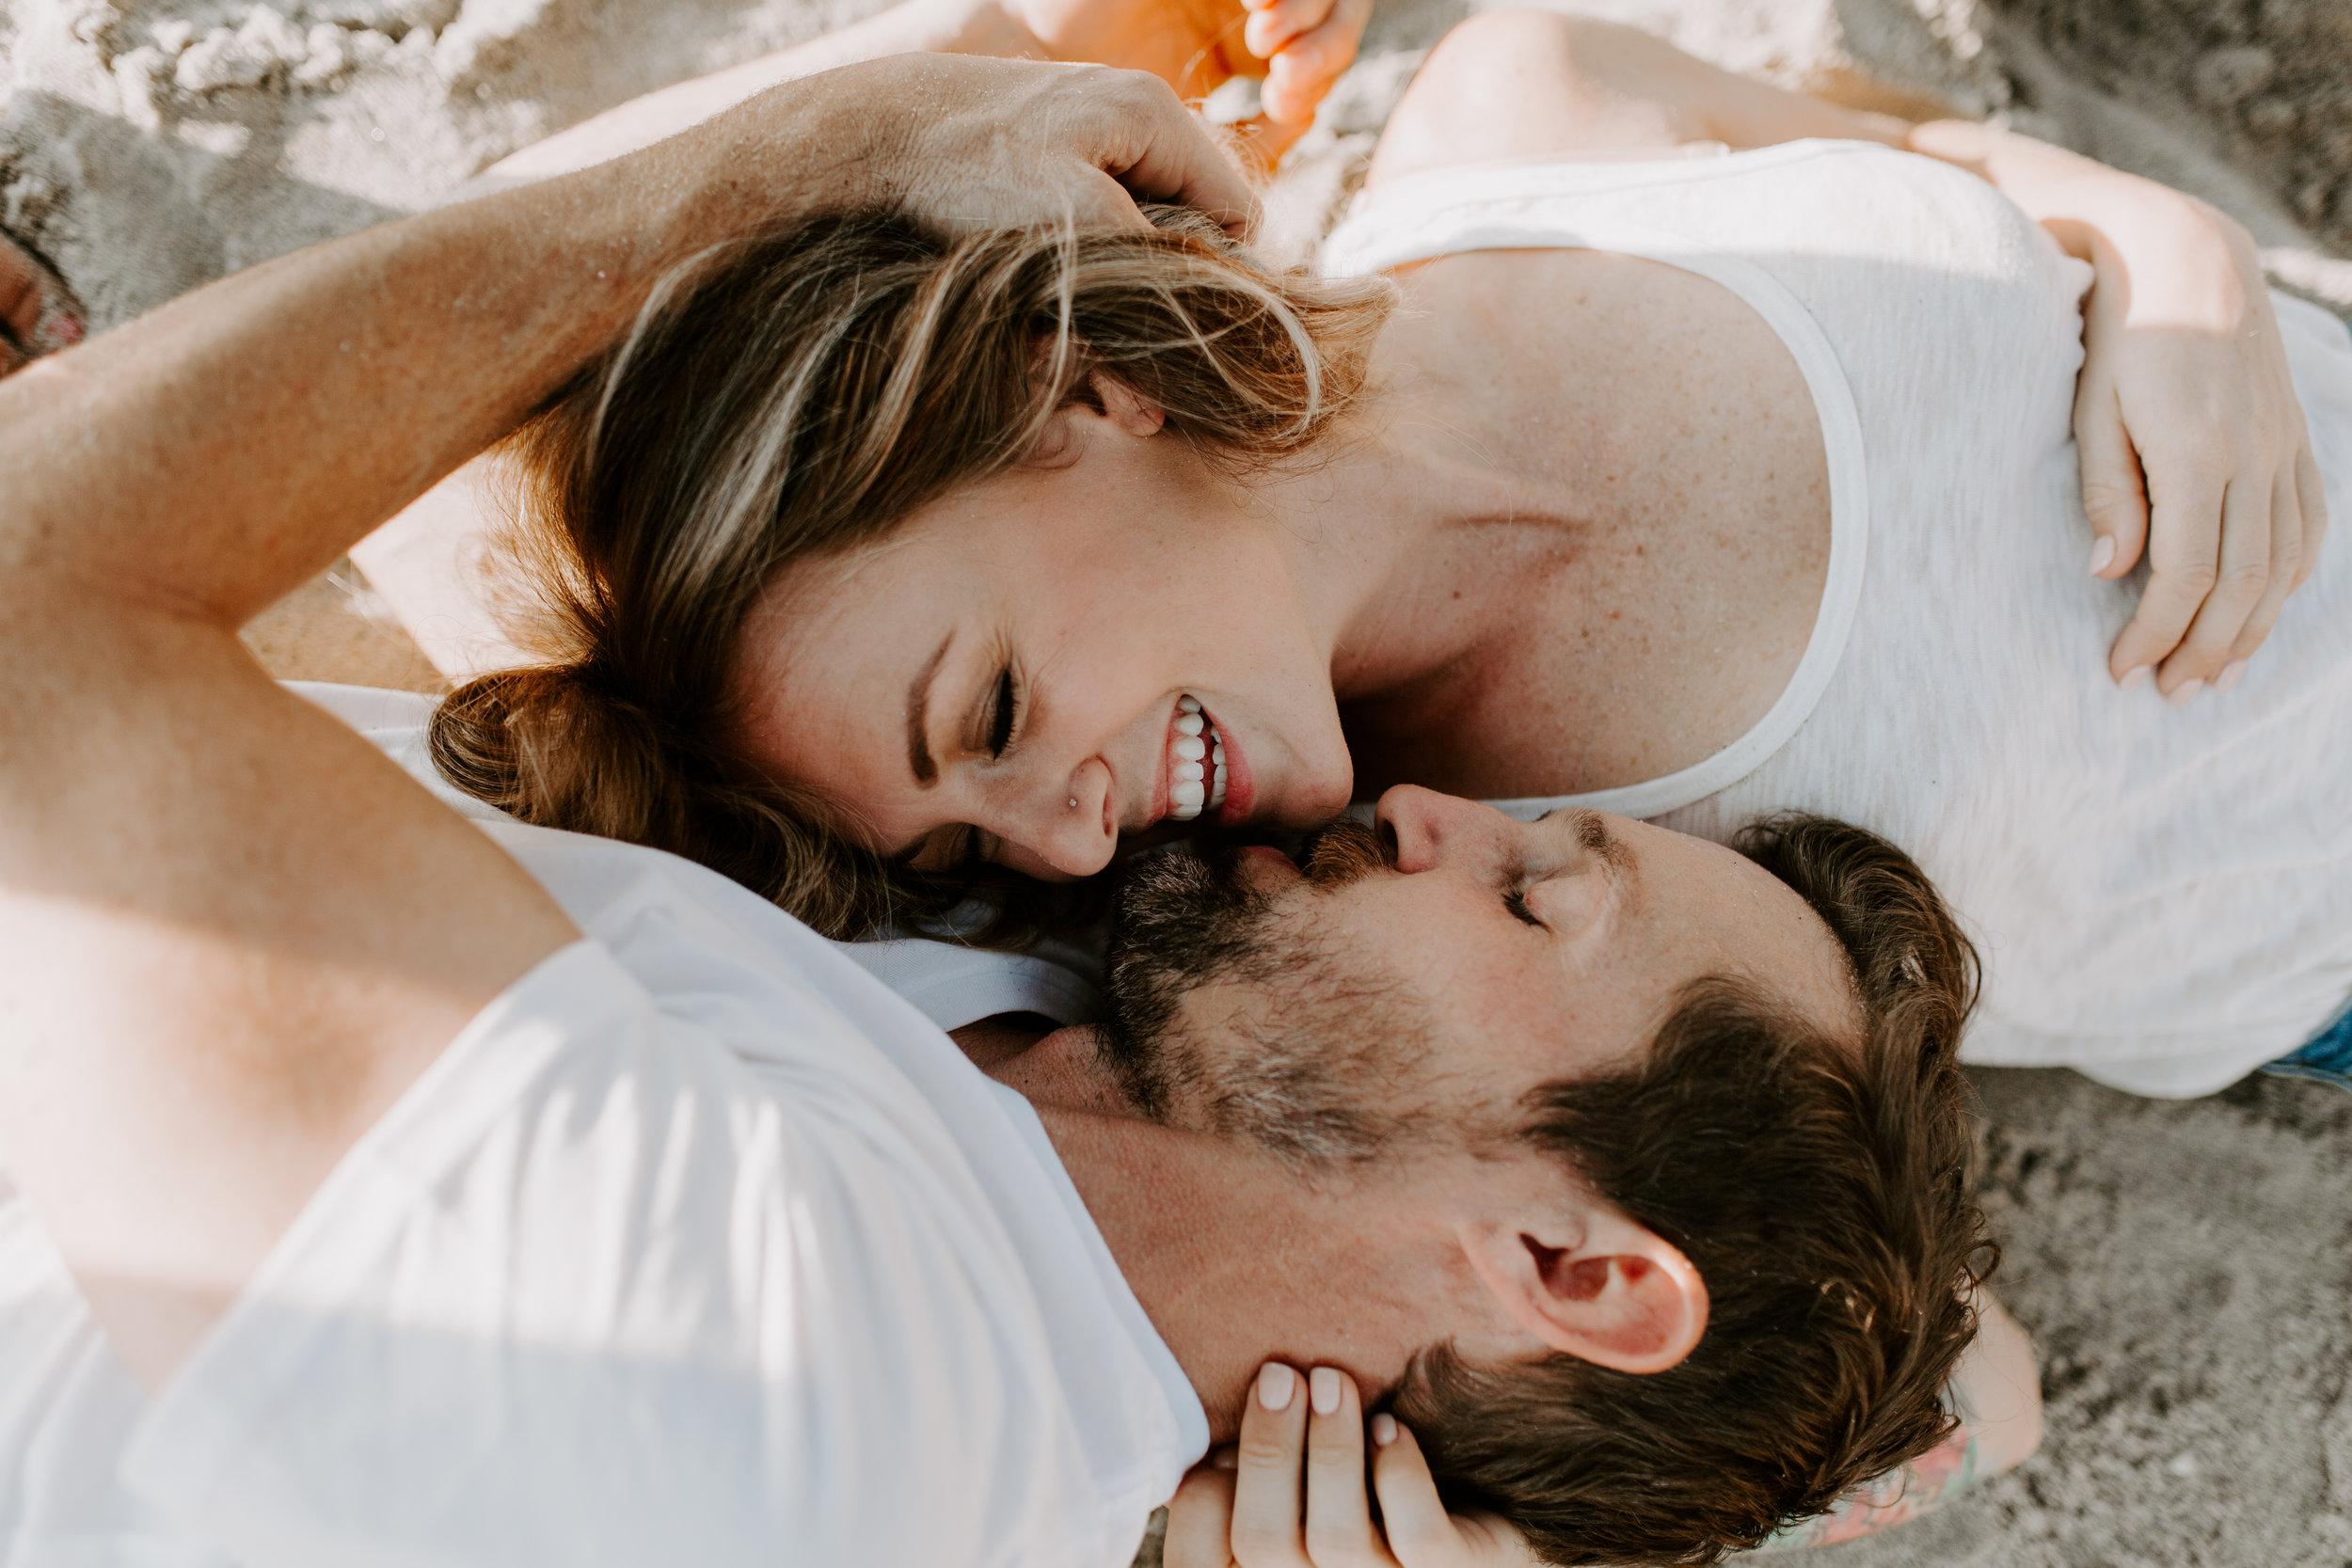 maia_chloe_photo_mae_and_tyler_laguna_beach_couple_kiss_november_2018